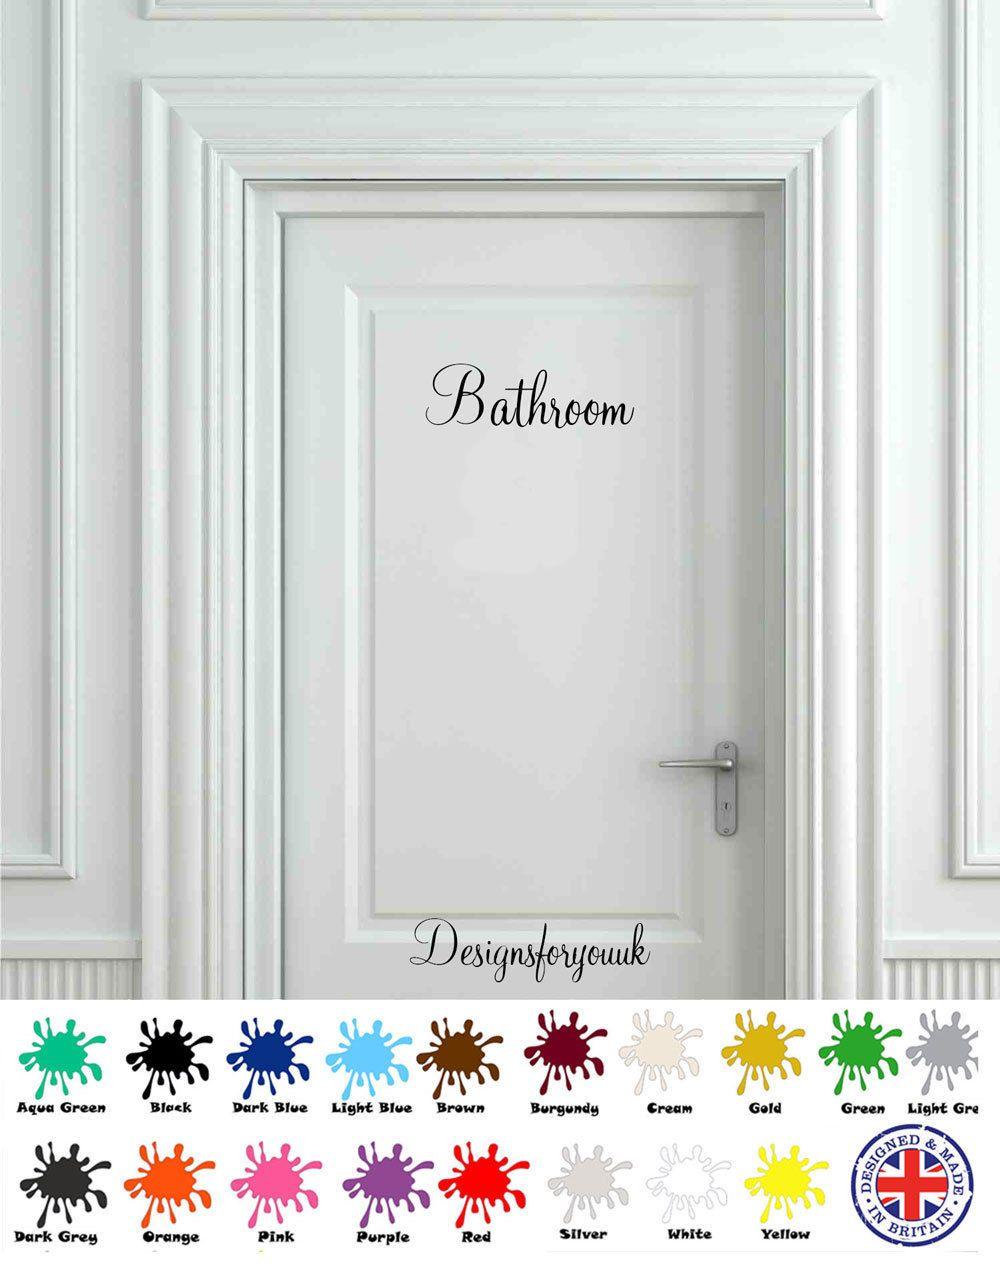 Bathroom door wall art decal vinyl sign sticker toilet wc pub